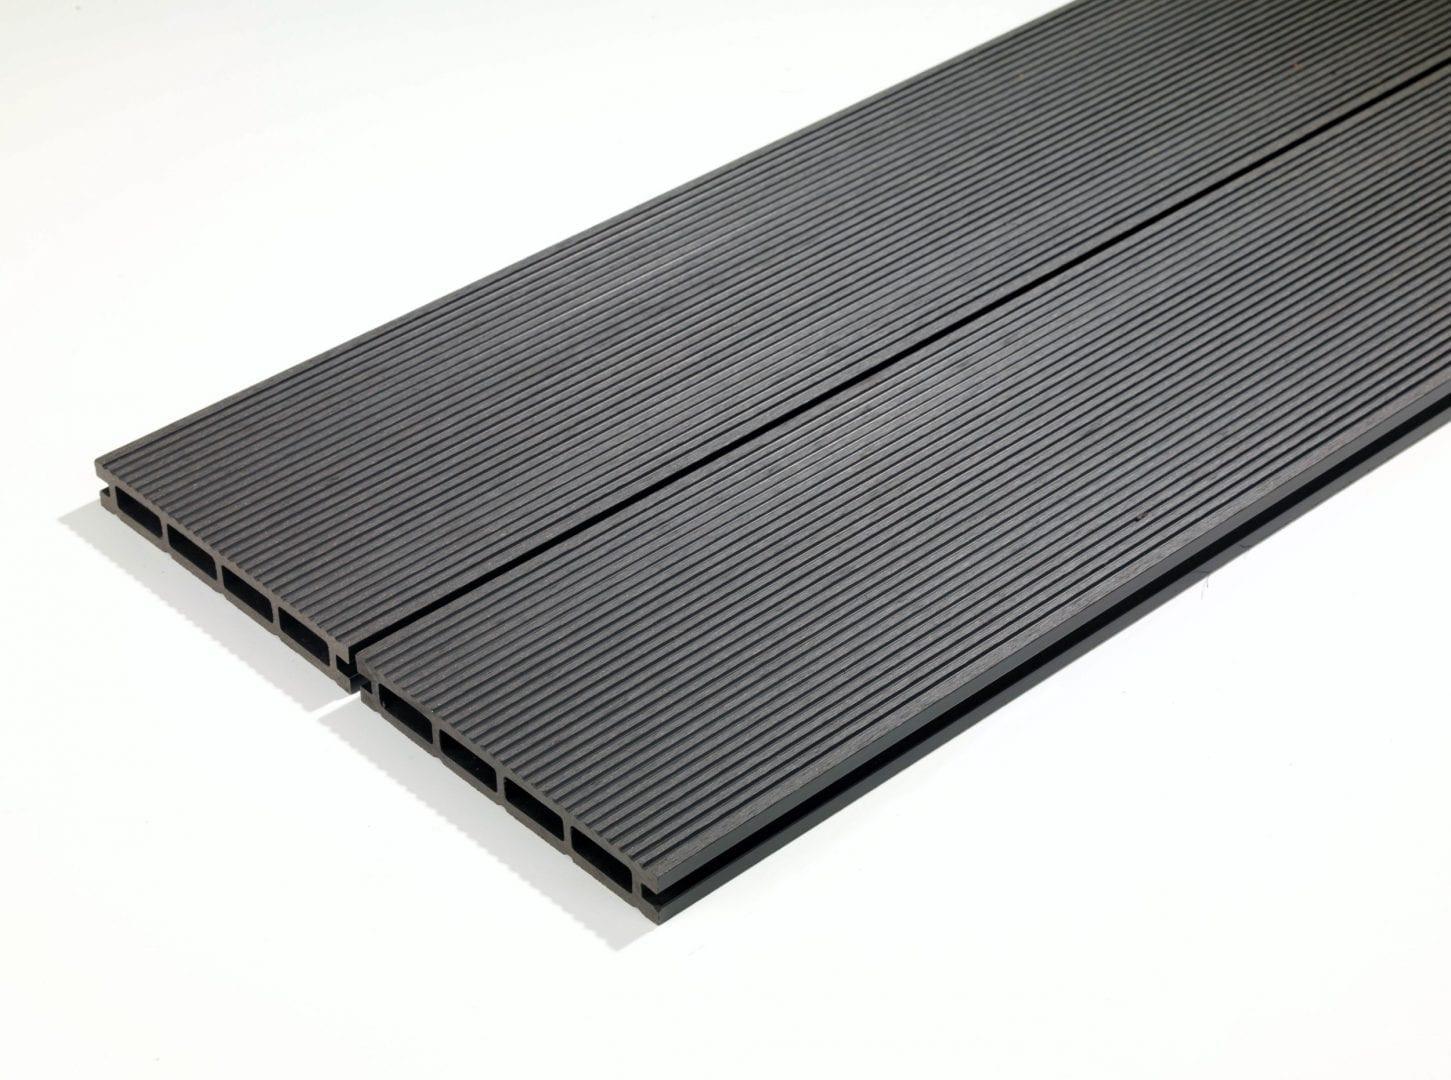 4m Composite Decking Boards Granite Jet